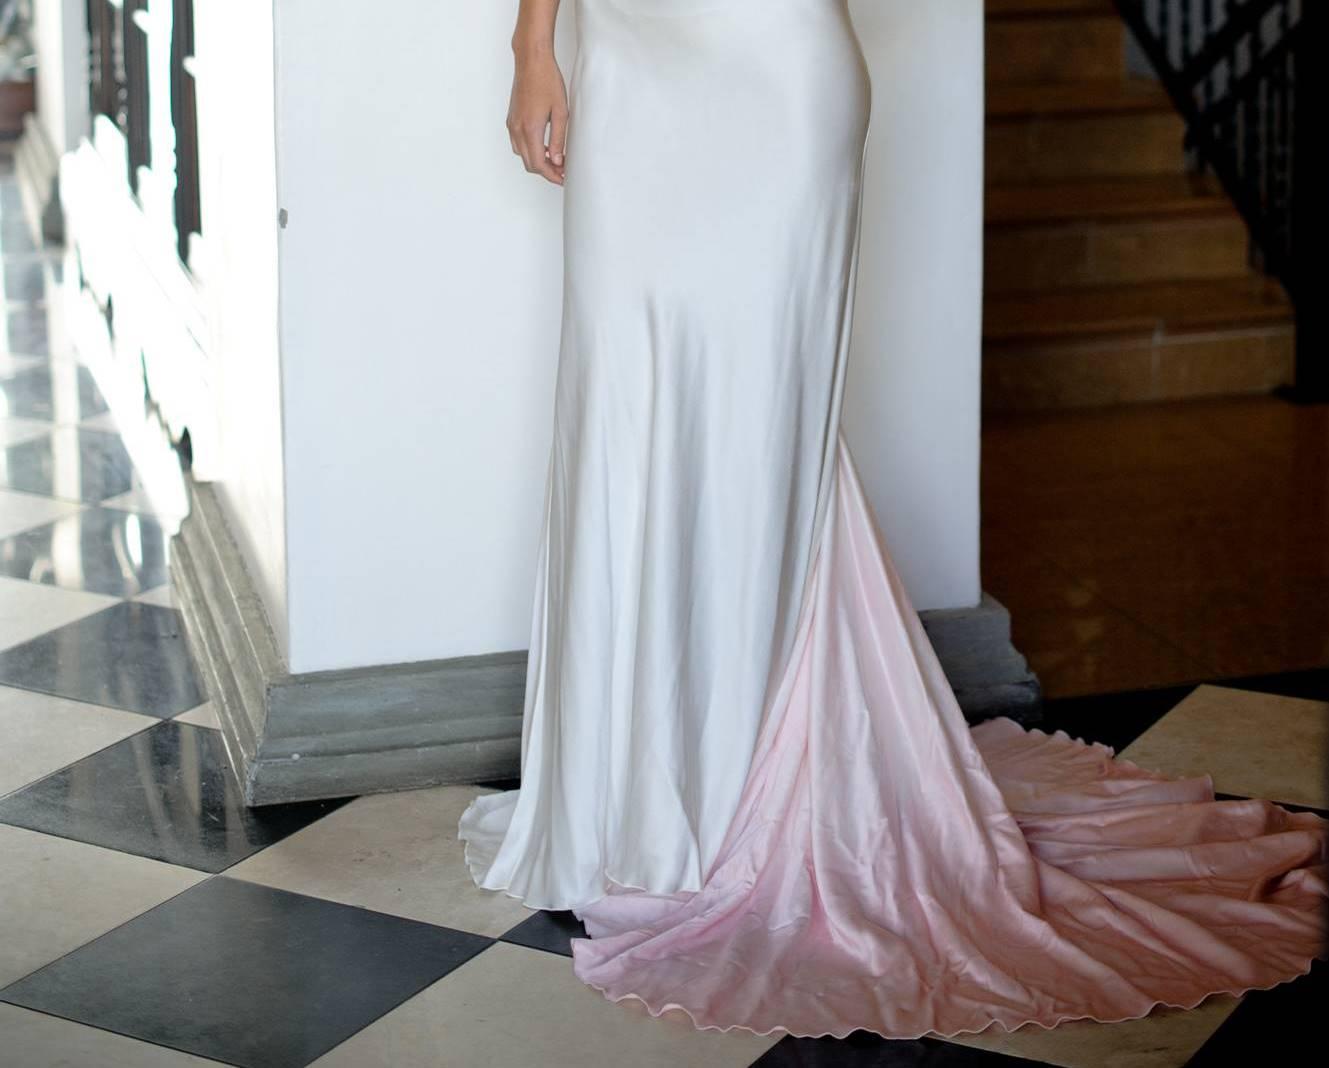 http://1.bp.blogspot.com/-J6rcUhLmCOg/Tsj3EcVHwJI/AAAAAAAACBY/gaVpoK_KVFM/s1600/Hendrik+Vermeulen+Couture+ombre+pink+train+on+dress.jpg